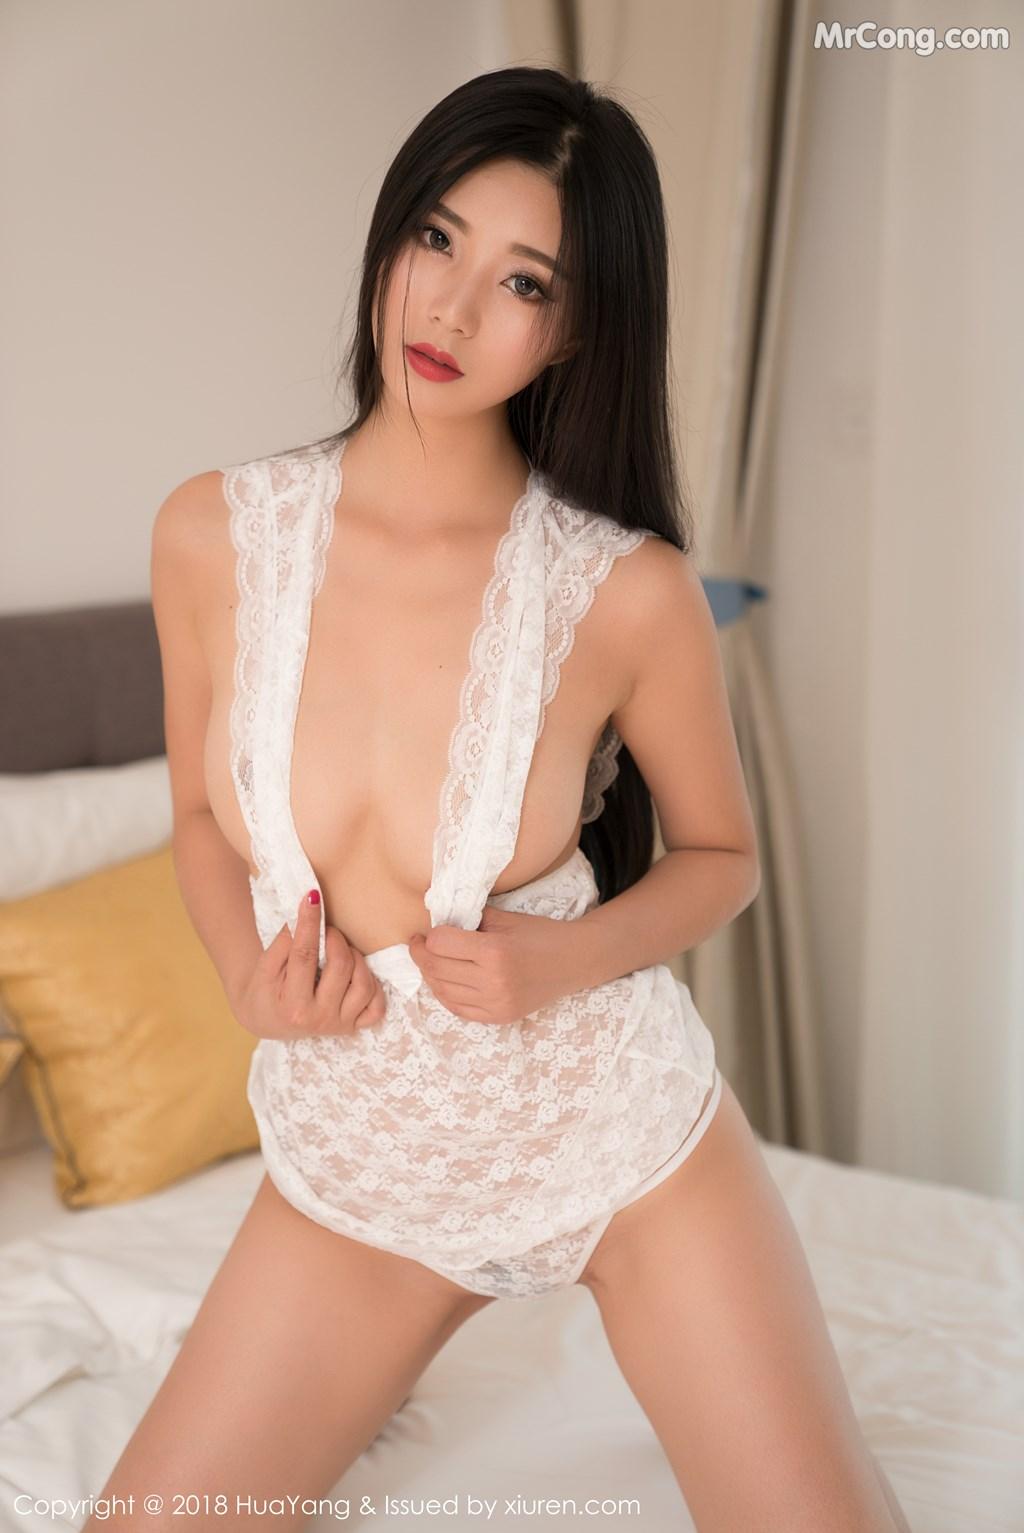 Image HuaYang-2018-02-28-Vol.033-KiKi-MrCong.com-006 in post HuaYang 2018-02-28 Vol.033: Người mẫu 宋-KiKi (42 ảnh)